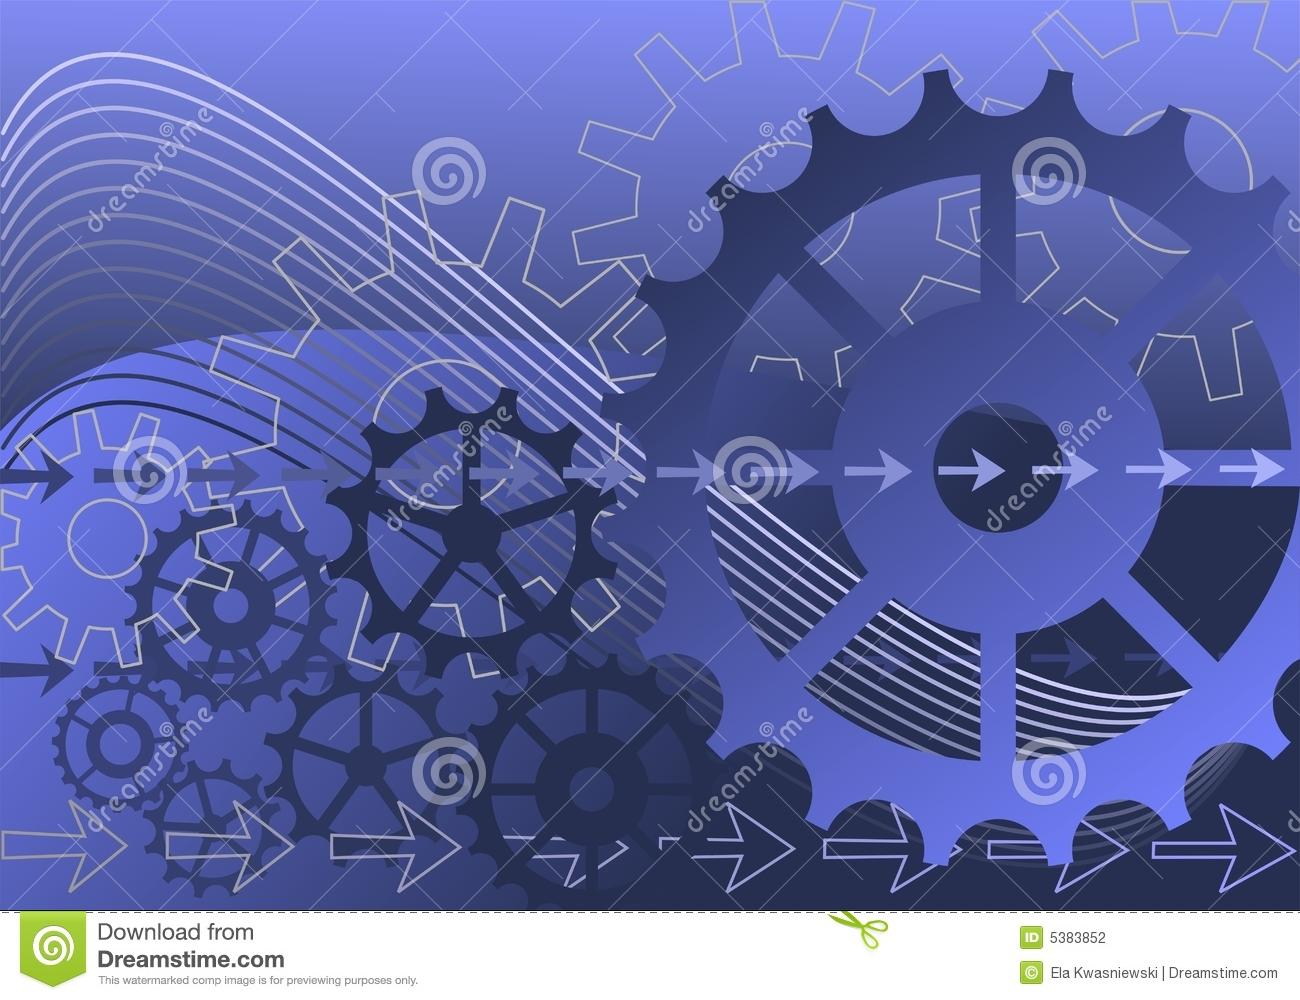 Mechanical Engineering Wallpaper Background Mechanical eng 1300x1000